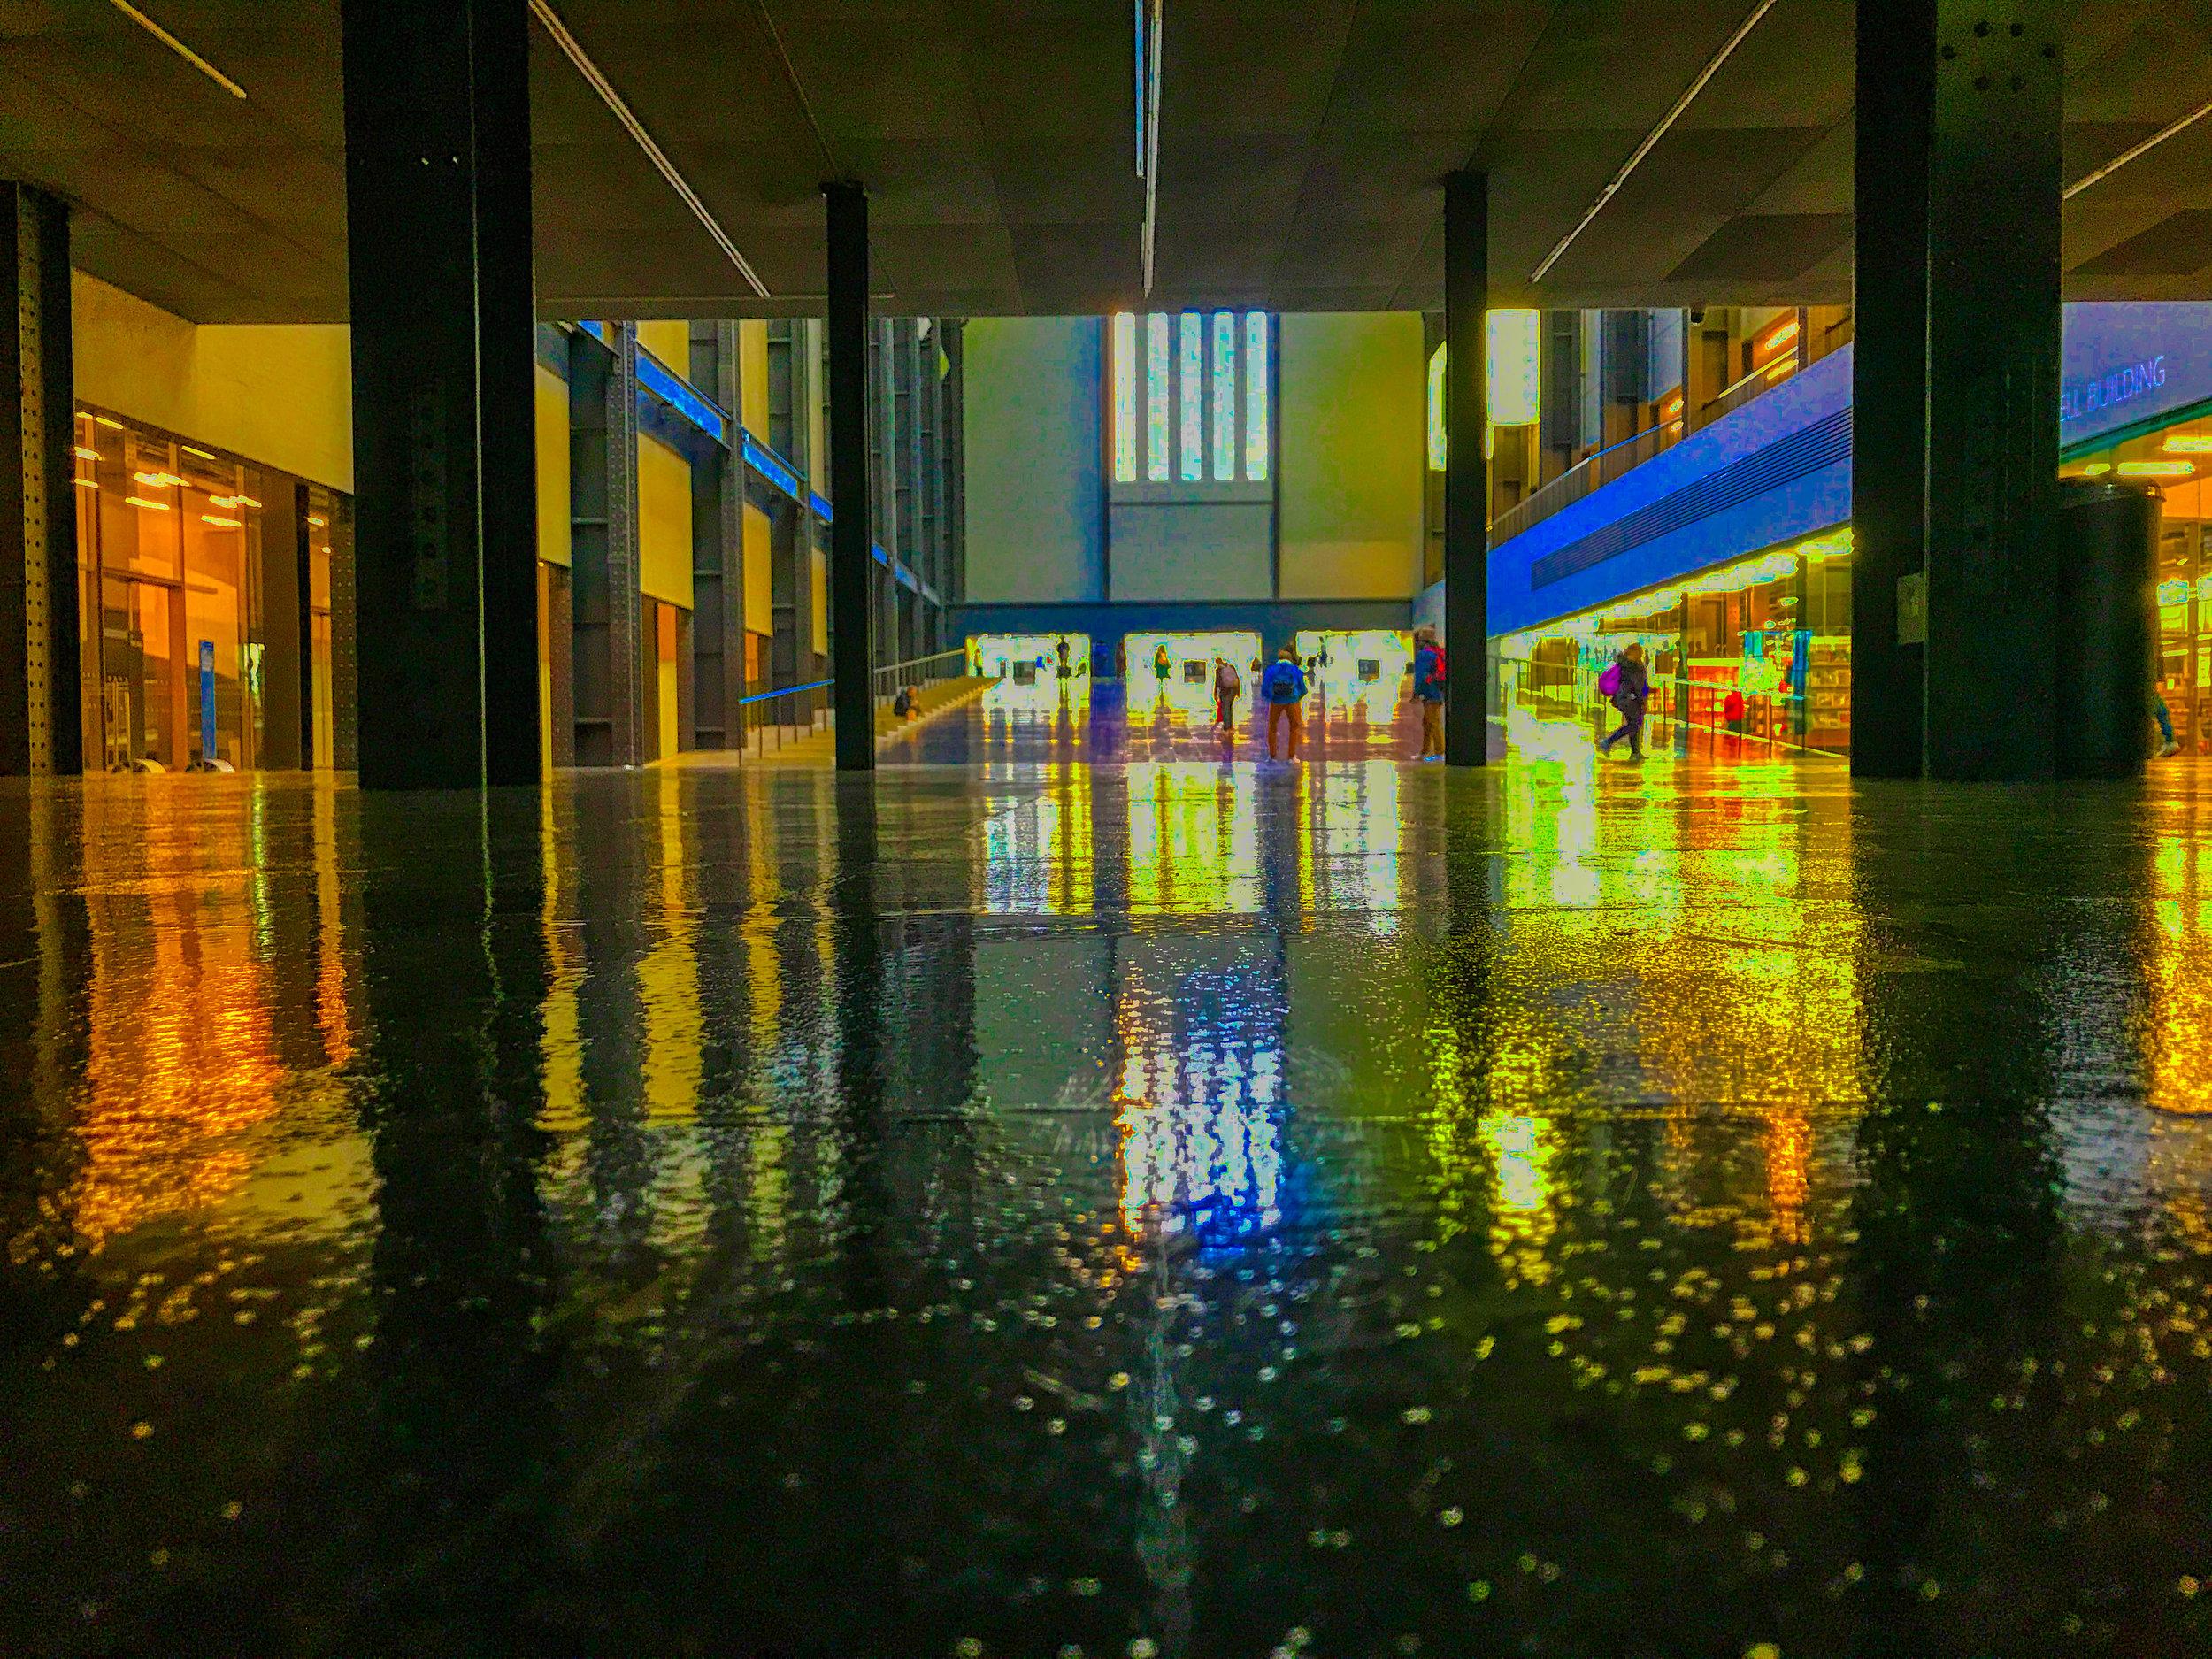 TATE MODERN - LONDON - TURBINE HALL